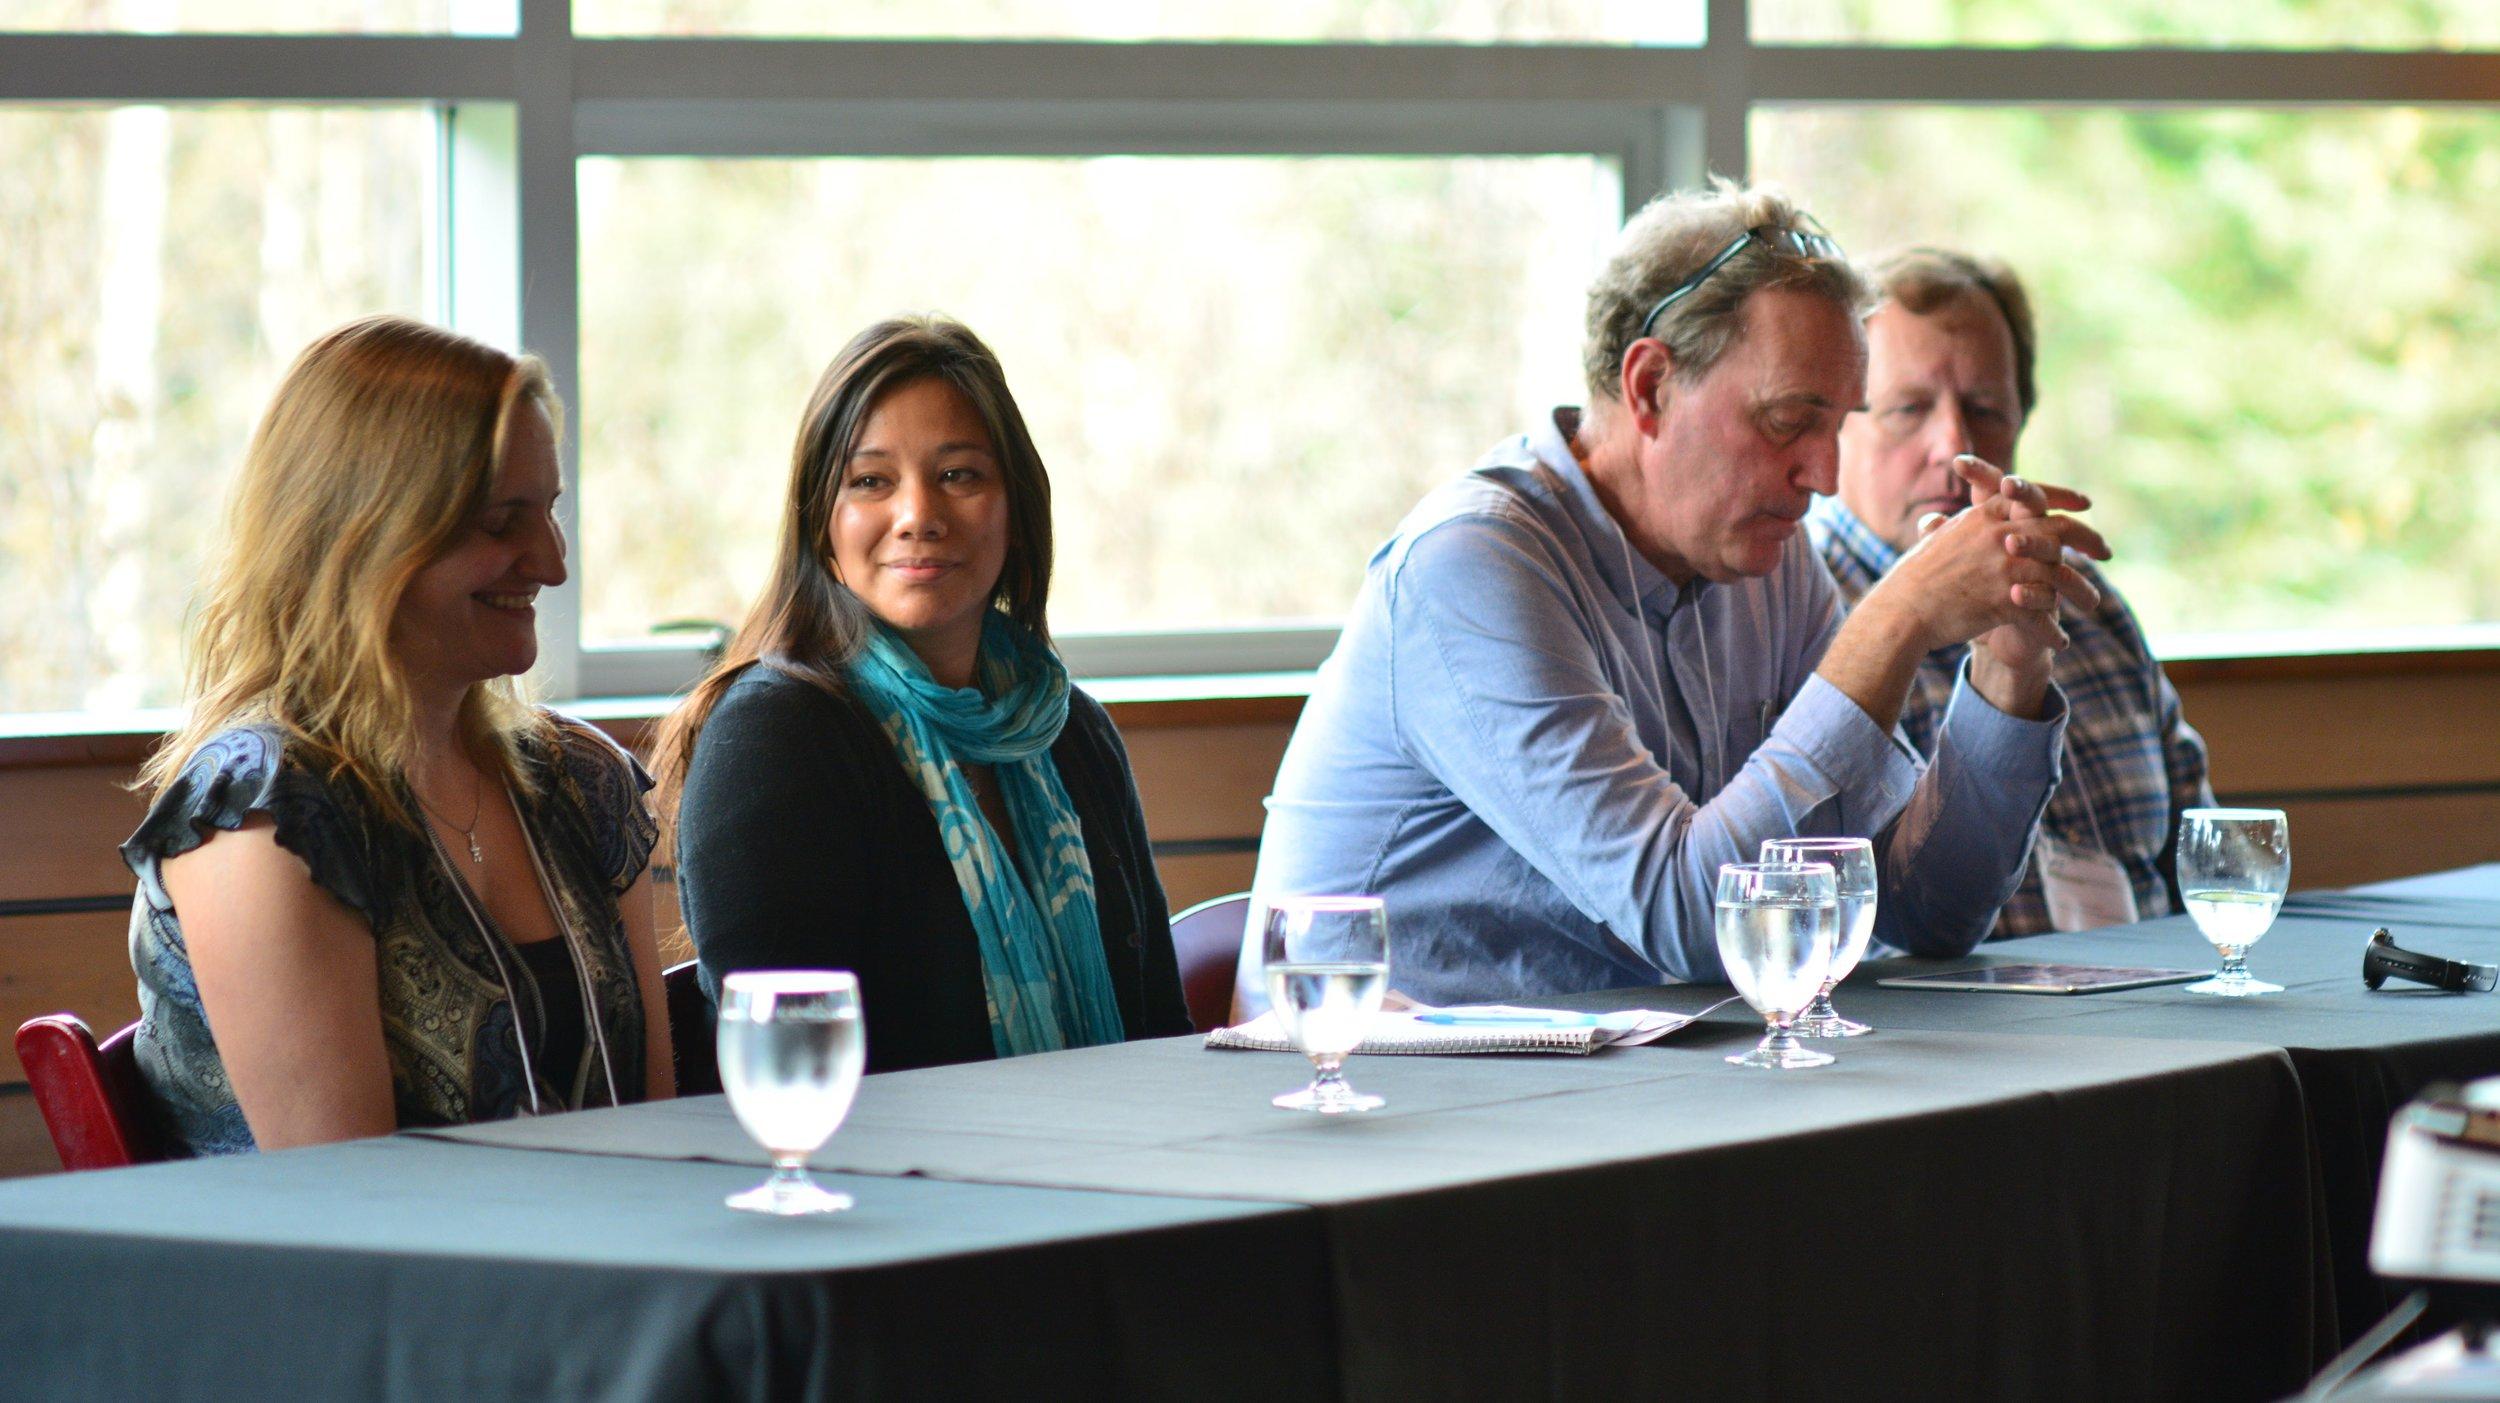 Dr. Sue Senger, St'át'imc Government Services, Jolene Patrick, Coast to Cascades Grizzly Bear Initiative,Tony Hamilton, BC Ministry of Environment & Johnny Mikes, Coast to Cascades Grizzly Bear Initiative.